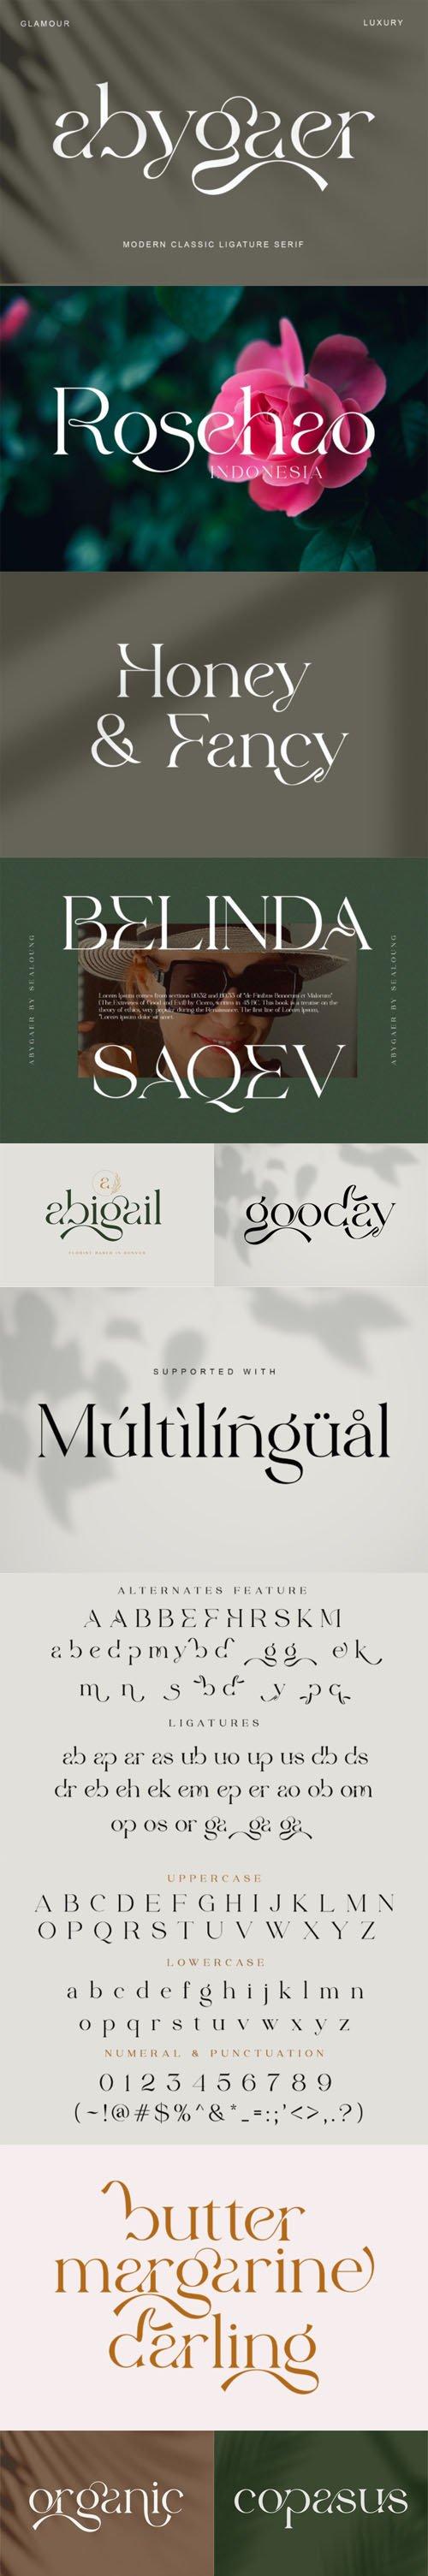 Abygaer Modern Classic Ligature Serif Font